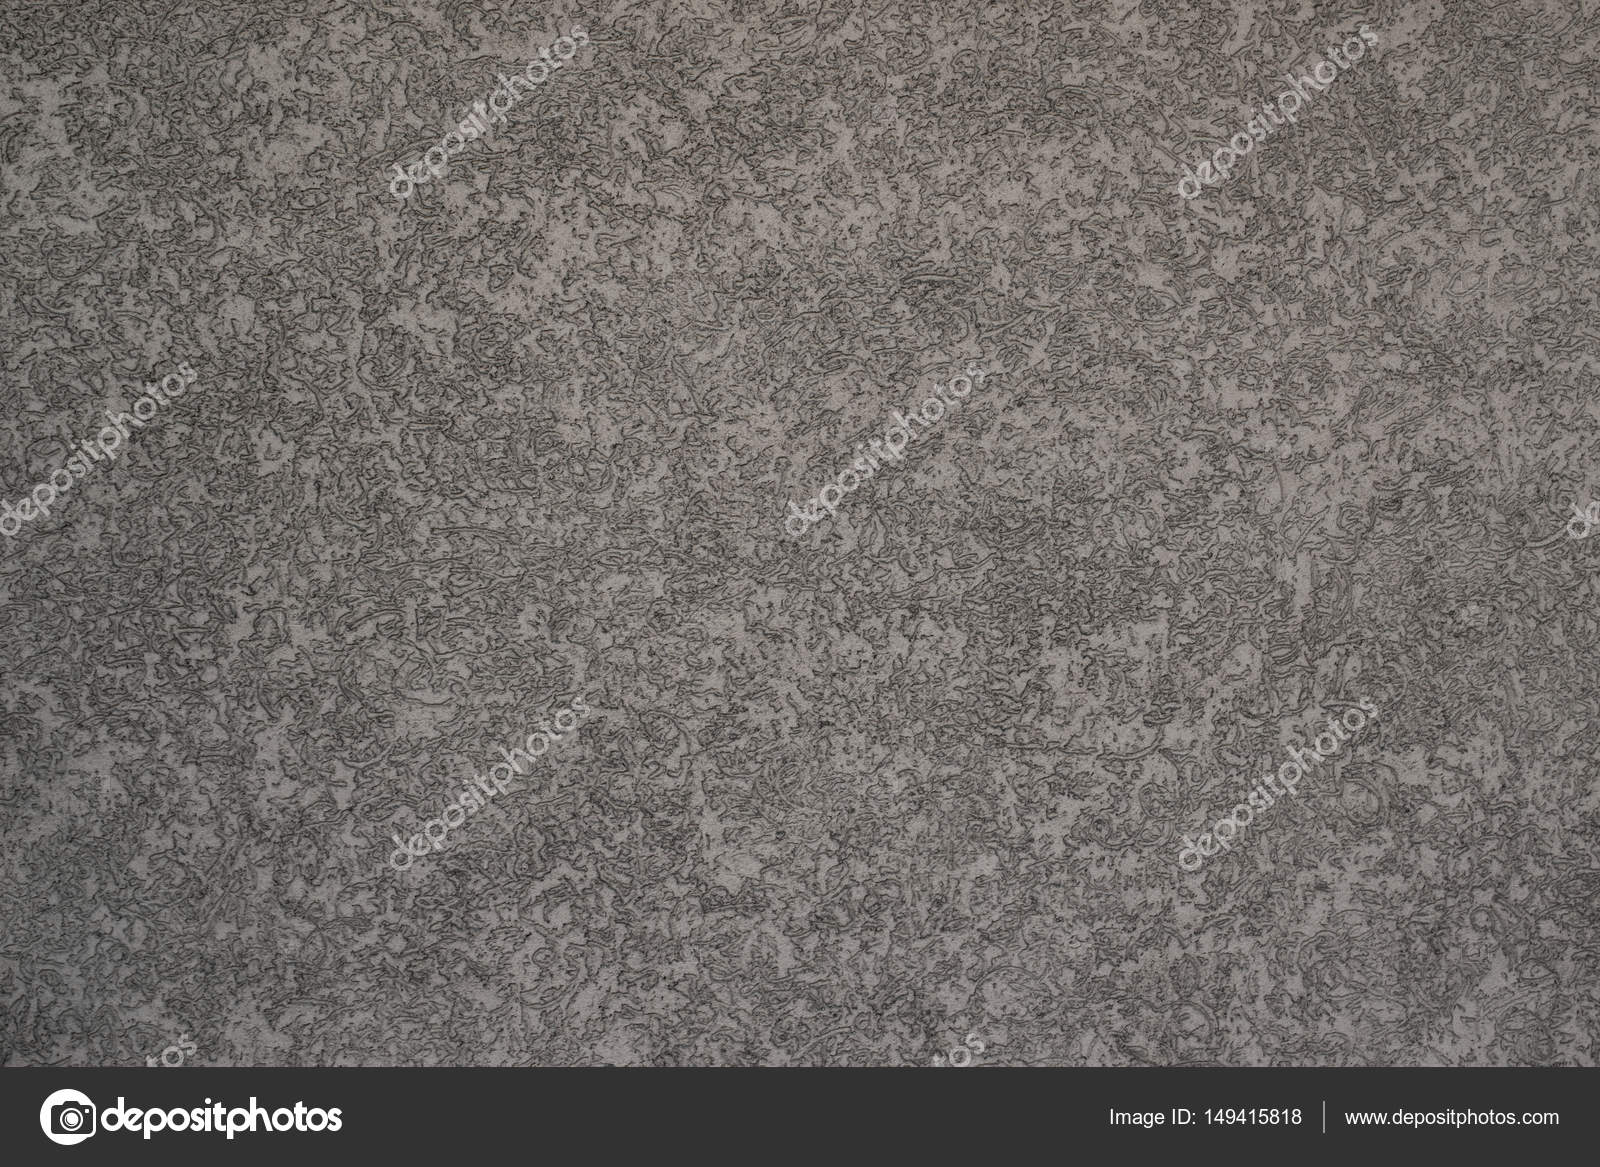 Zement Putz Wand Textur Mit Muster Stockfoto C Expresso 149415818